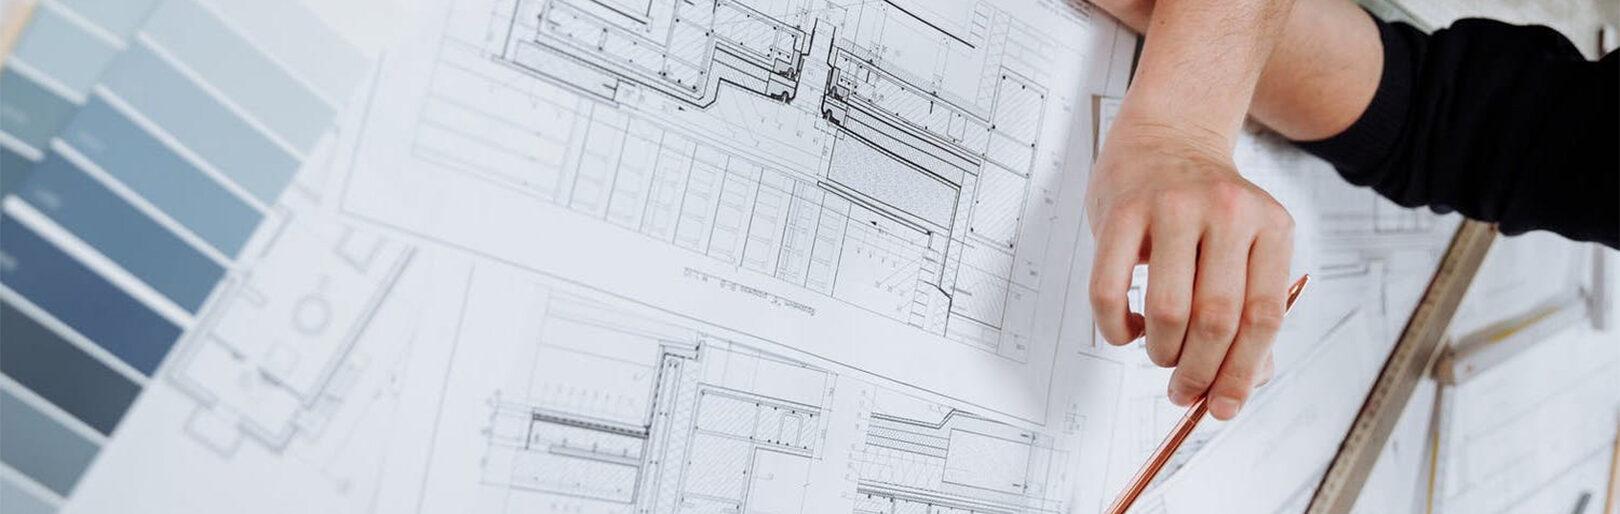 vacature interieurarchitect en technisch tekenaar hout te Asse